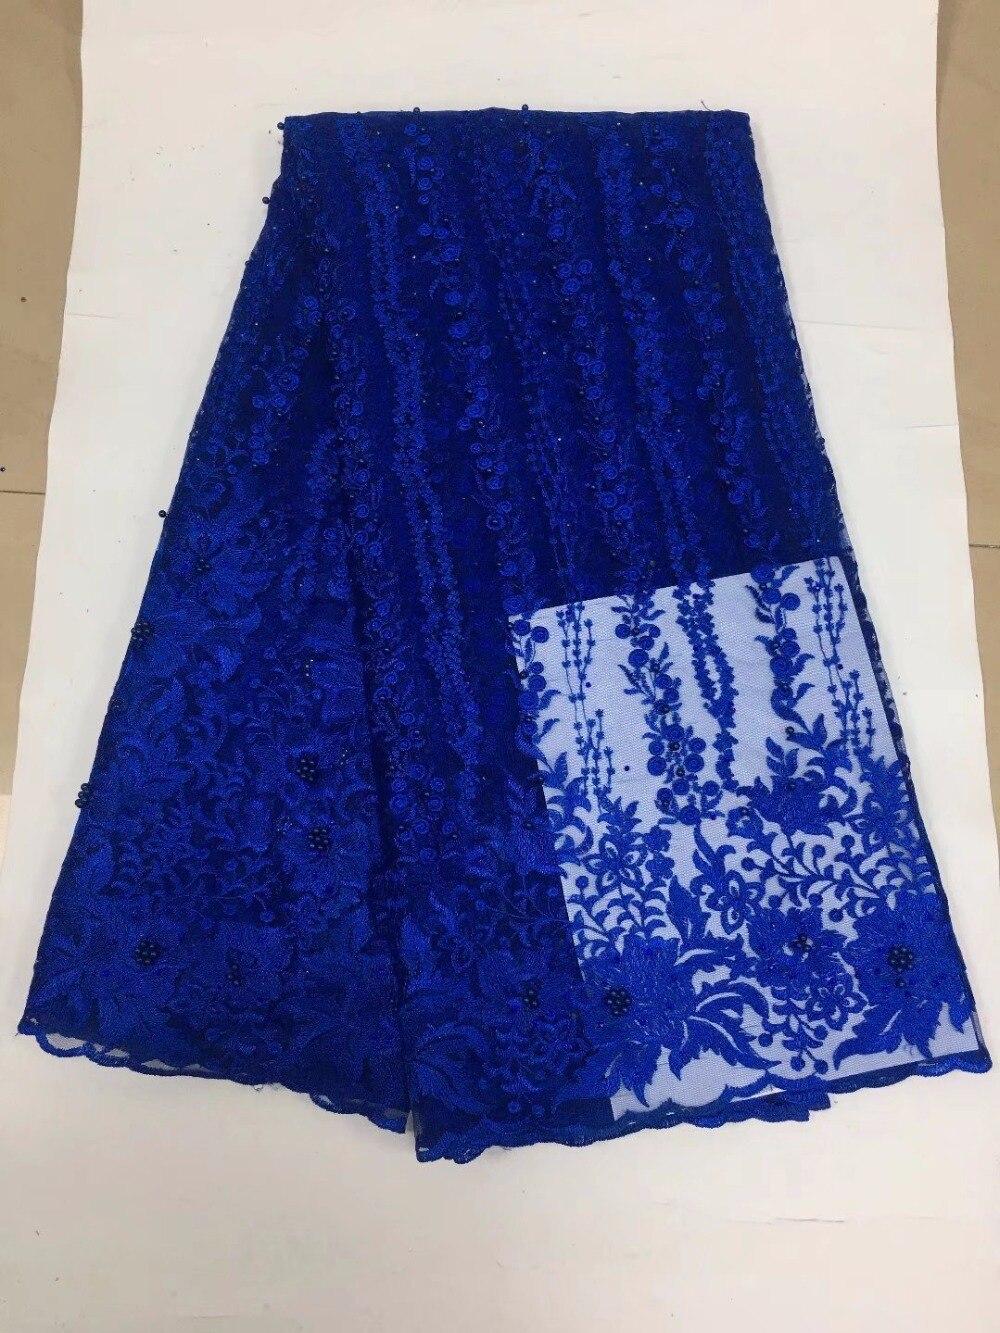 Belo tule tecido de renda líquida africano com contas de alta qualidade tecido laço francês africano para o vestido de casamento yda082 - 4